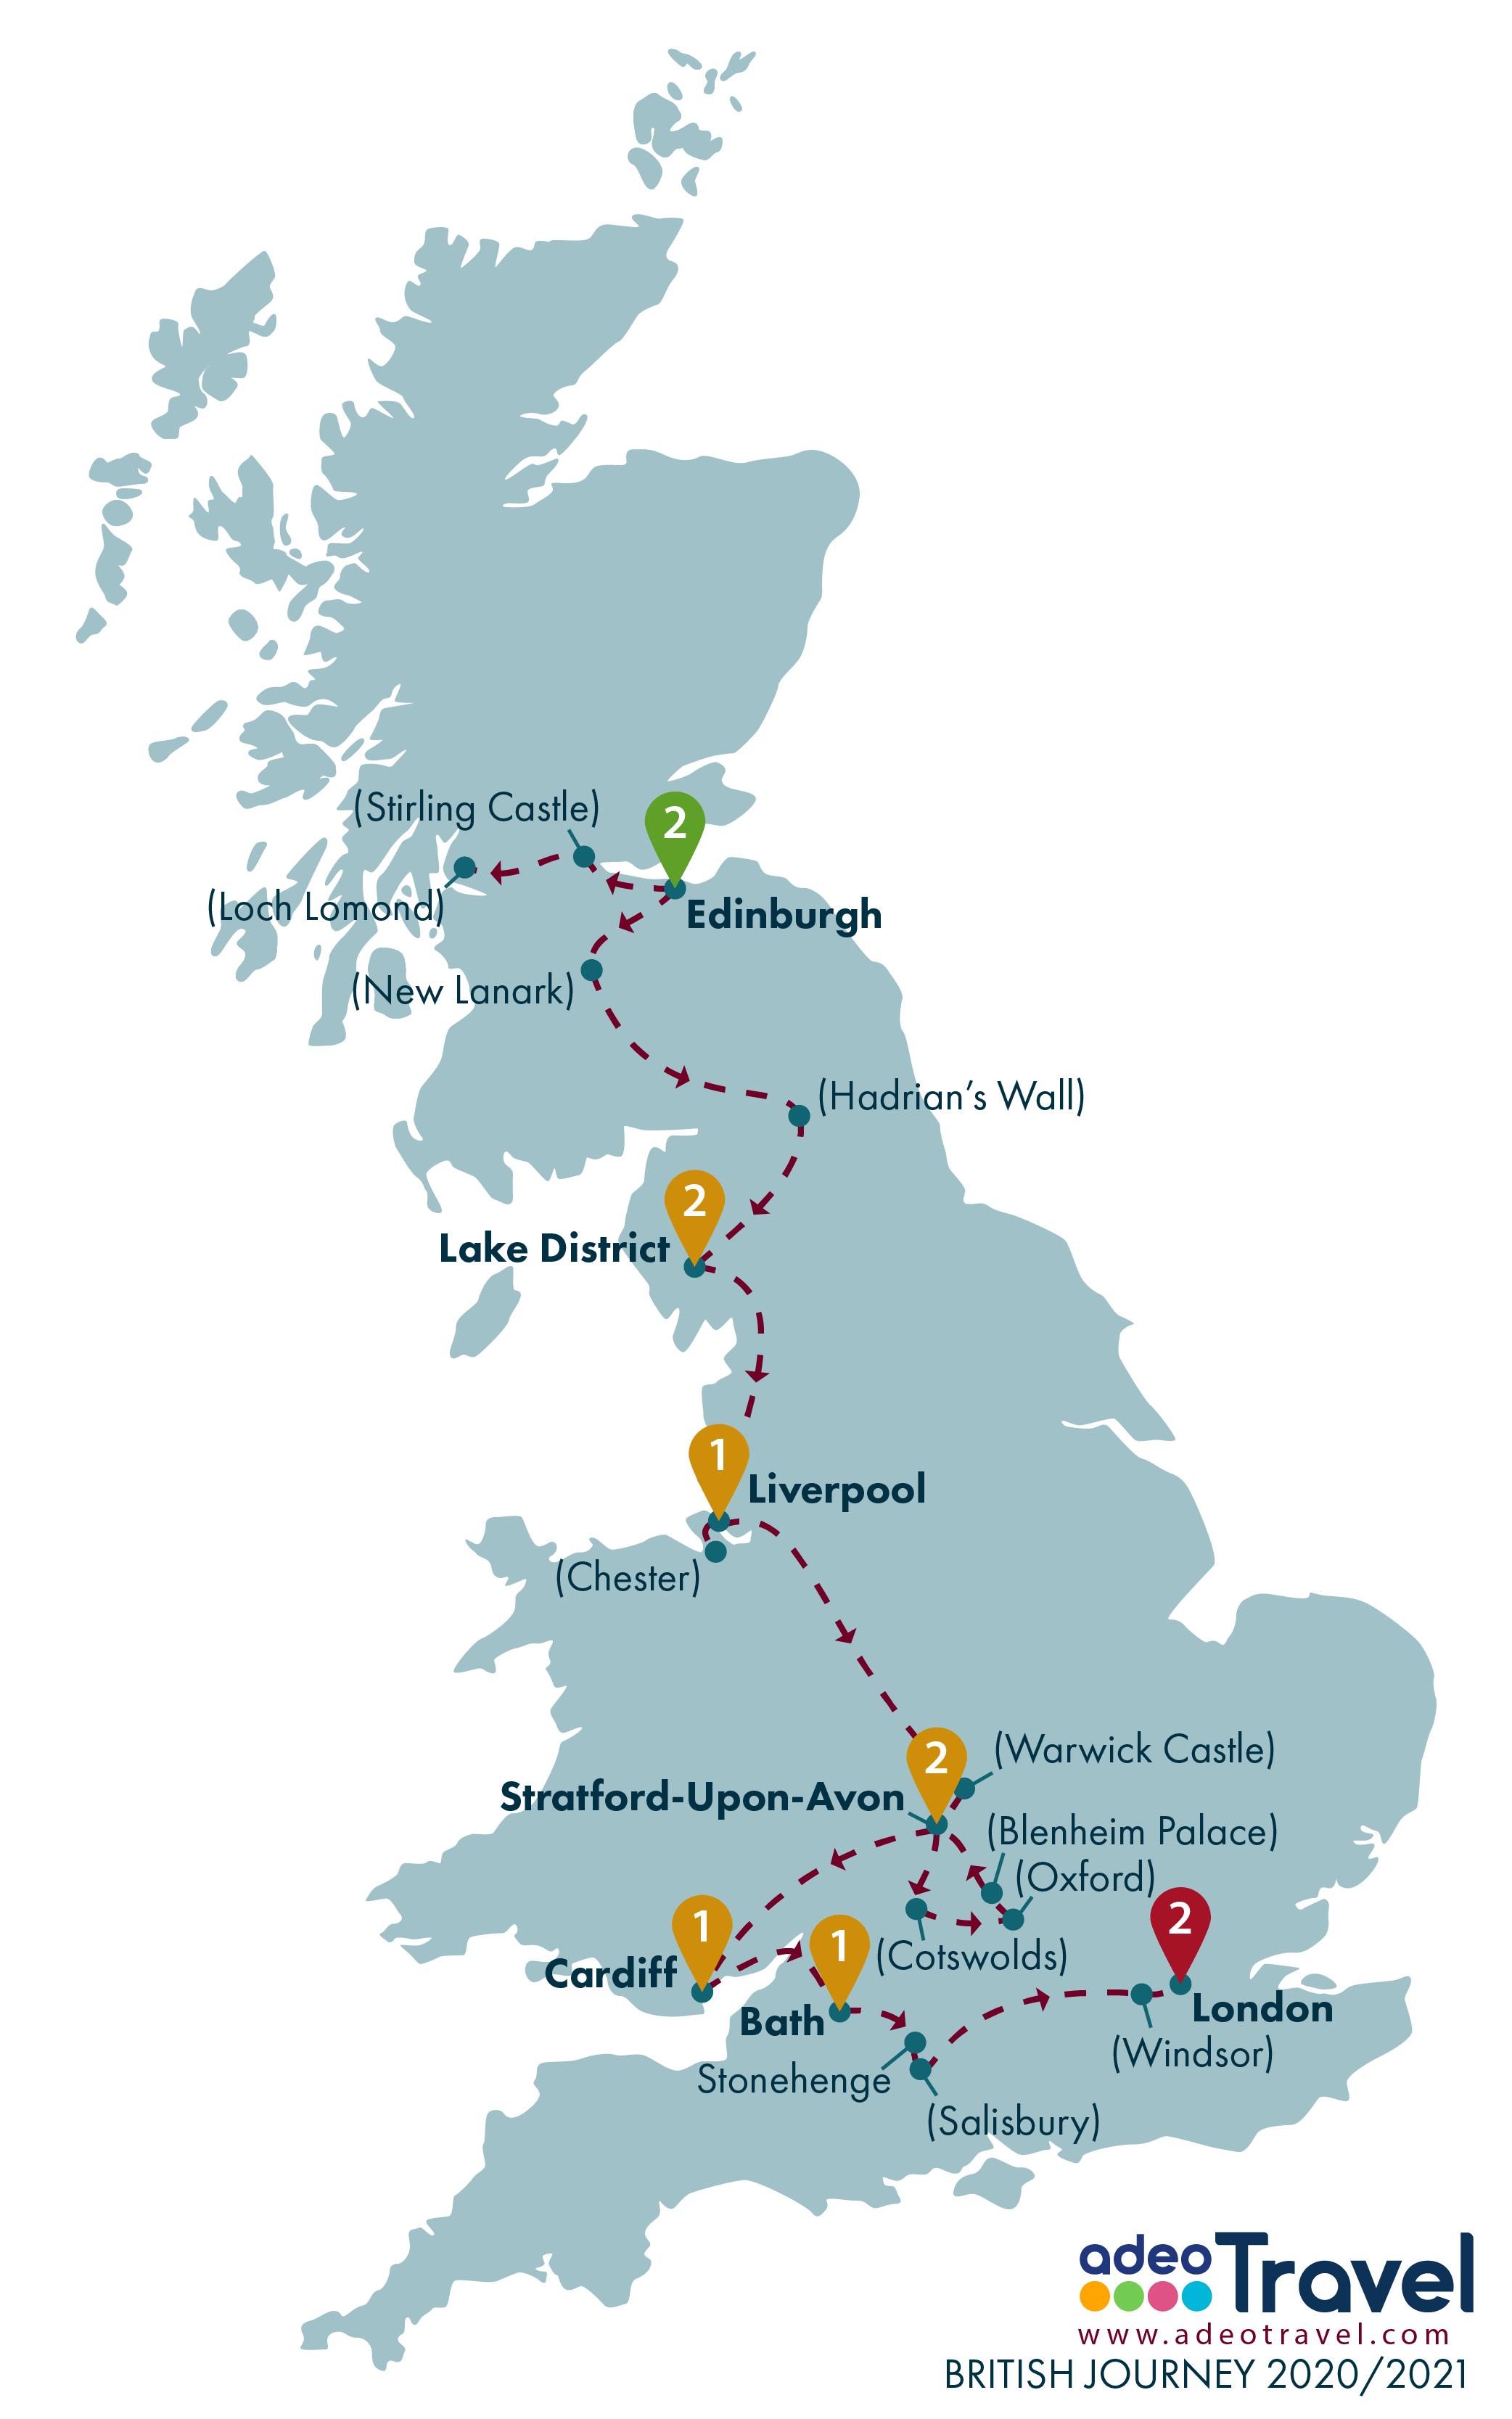 Map - British Journey 2020 2021